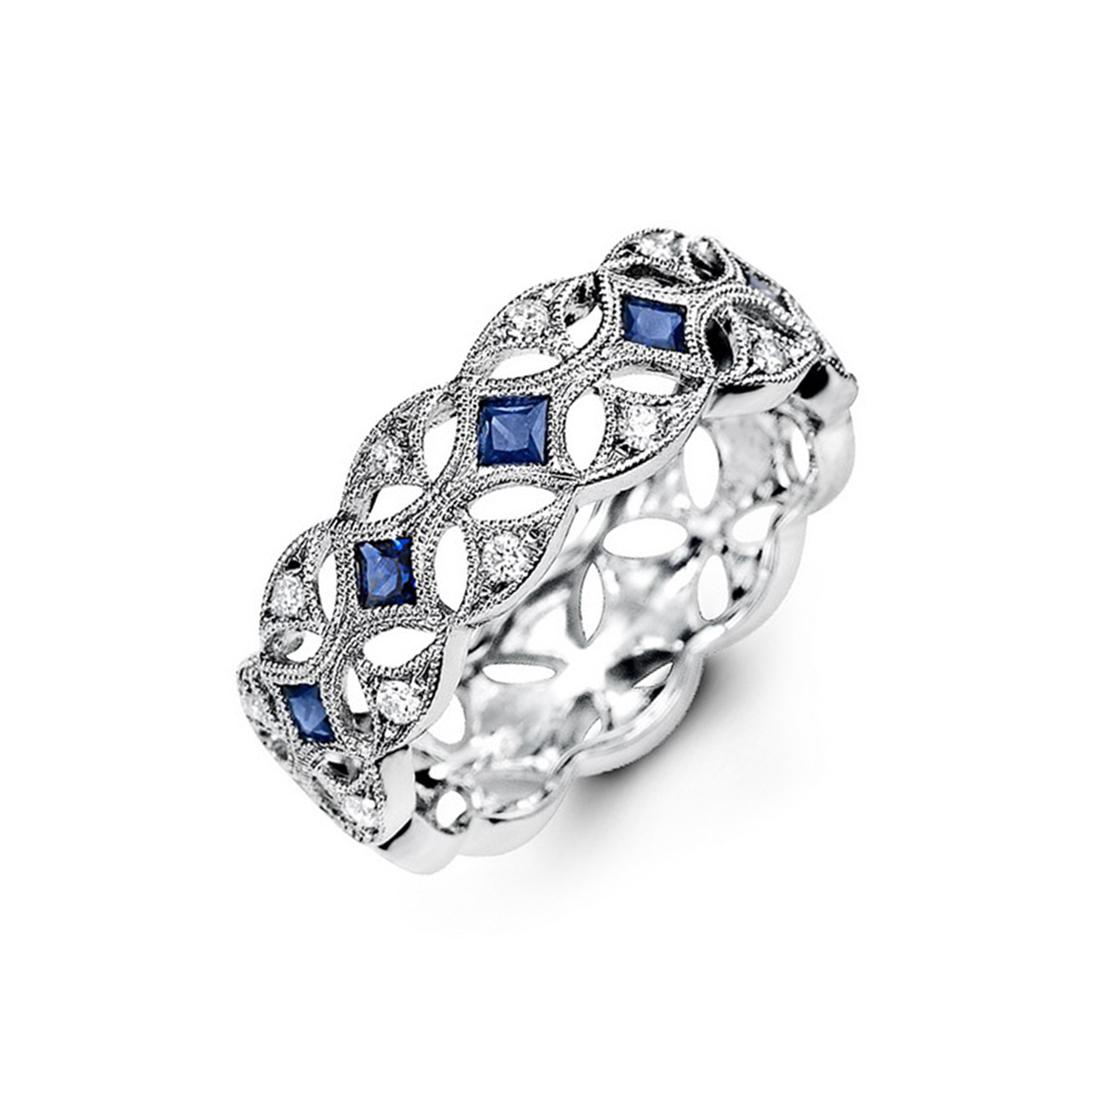 96 royal wedding bands amazing sapphire